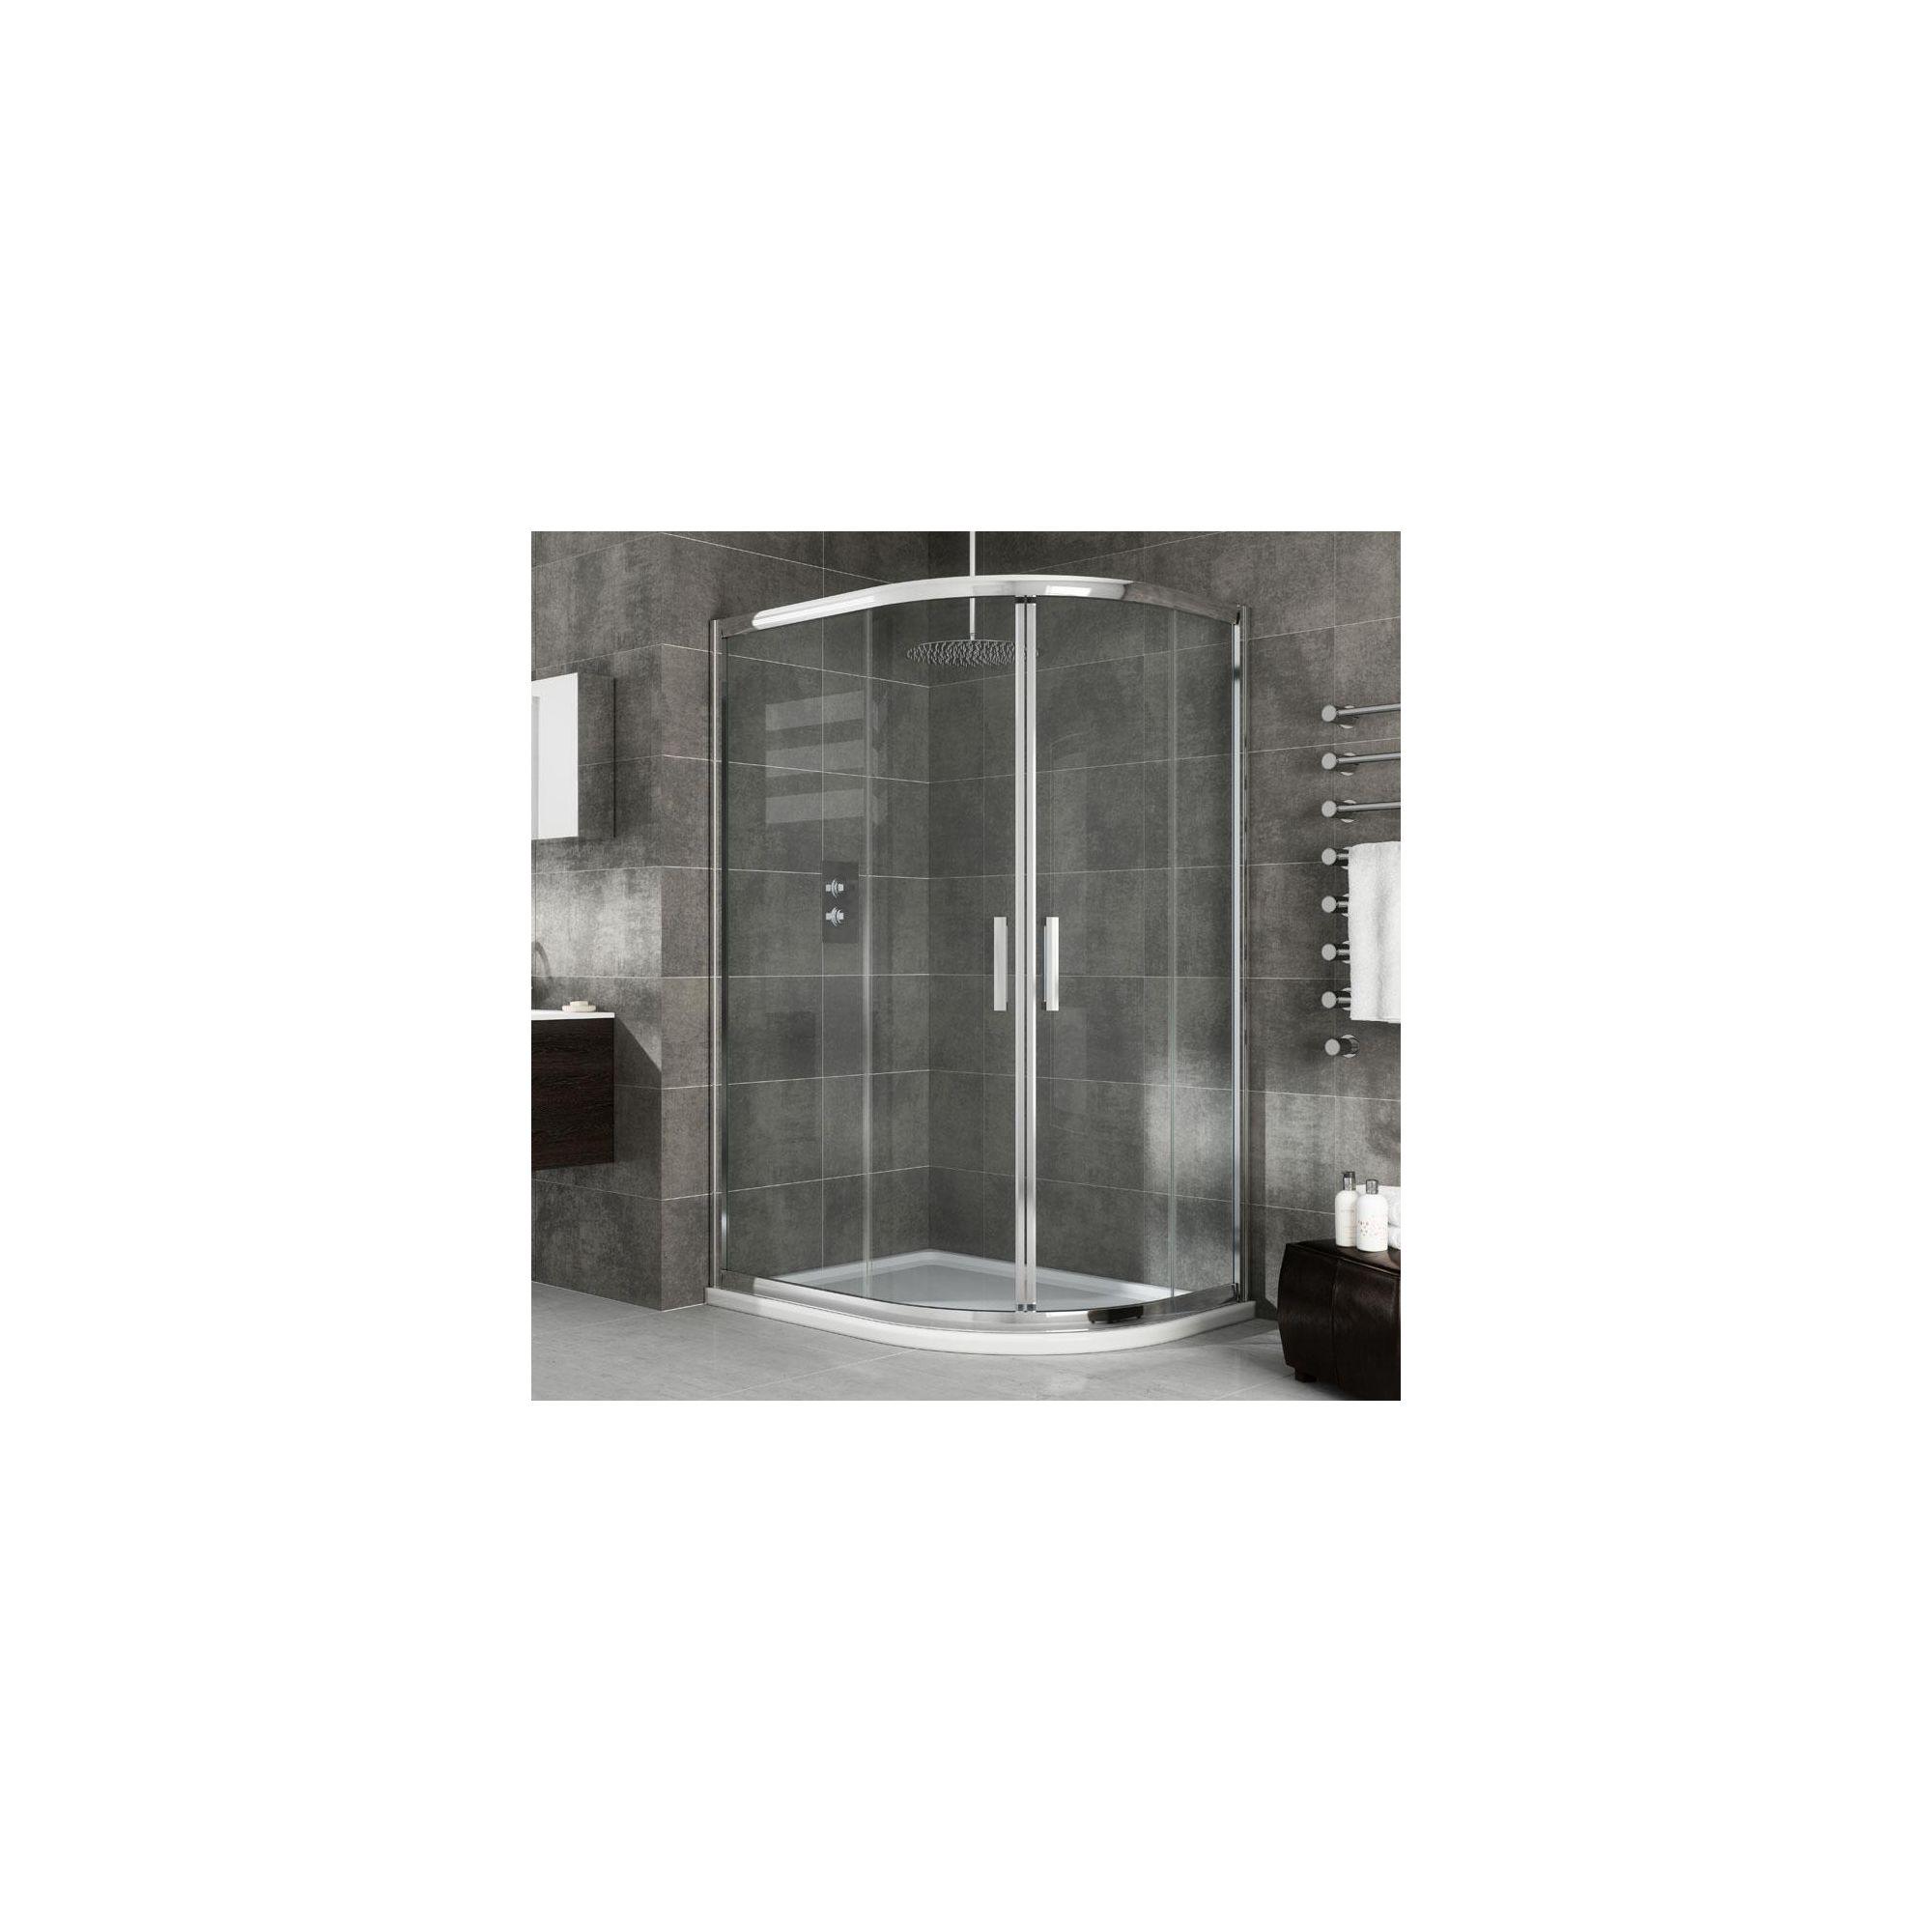 Elemis Eternity Two-Door Offset Quadrant Shower Door, 900mm x 800mm, 8mm Glass at Tescos Direct